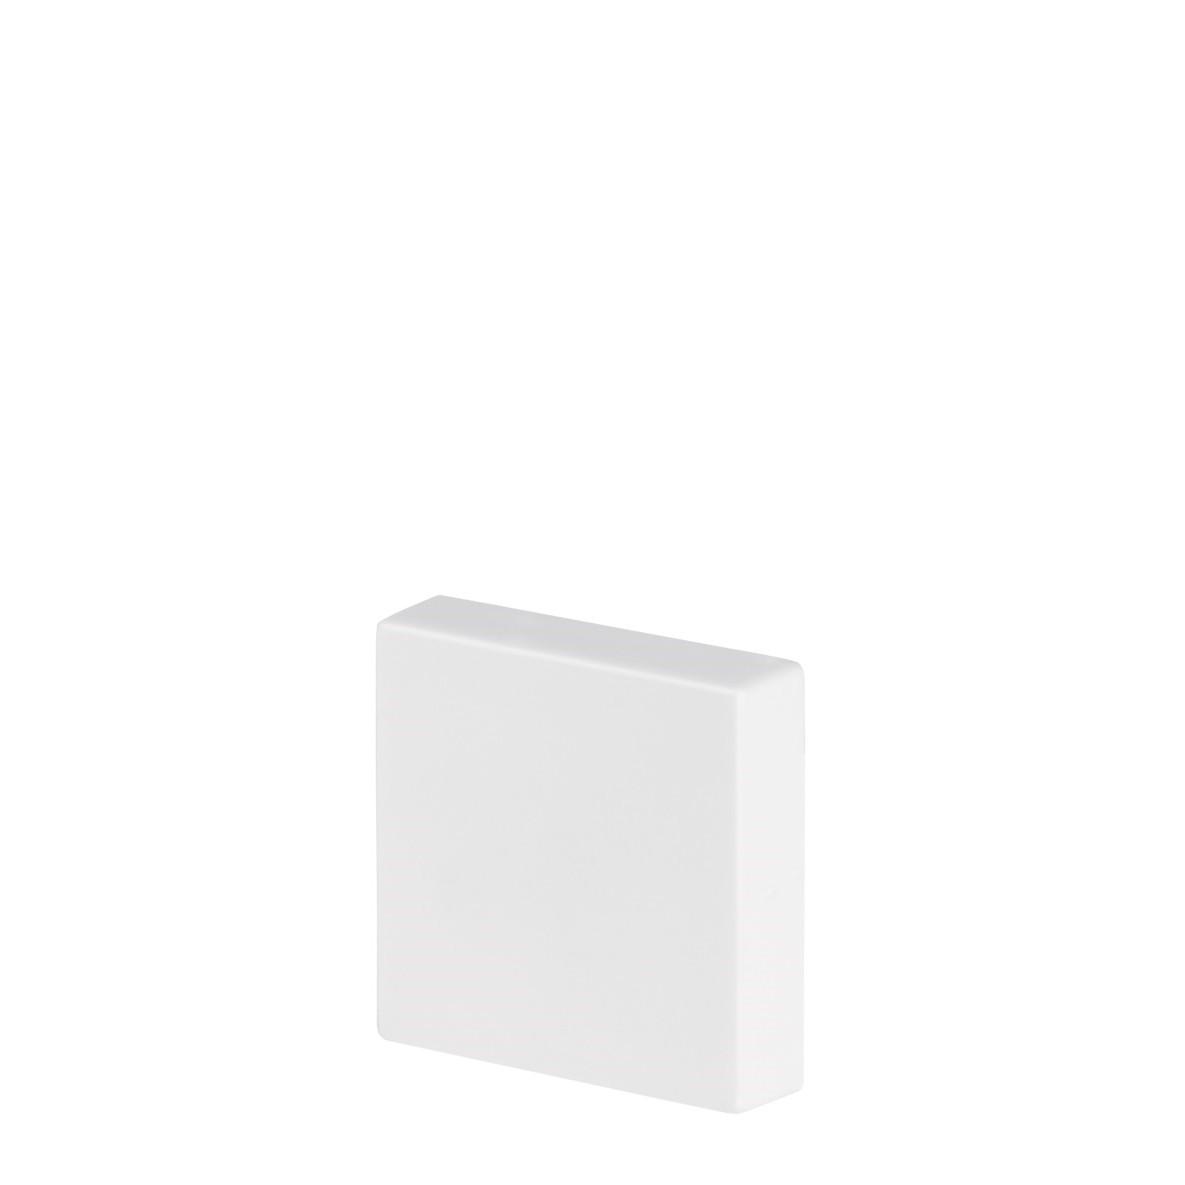 Rodape Alizar Roseta 7 x 1700 cm Poliestireno Branco - Arquitech